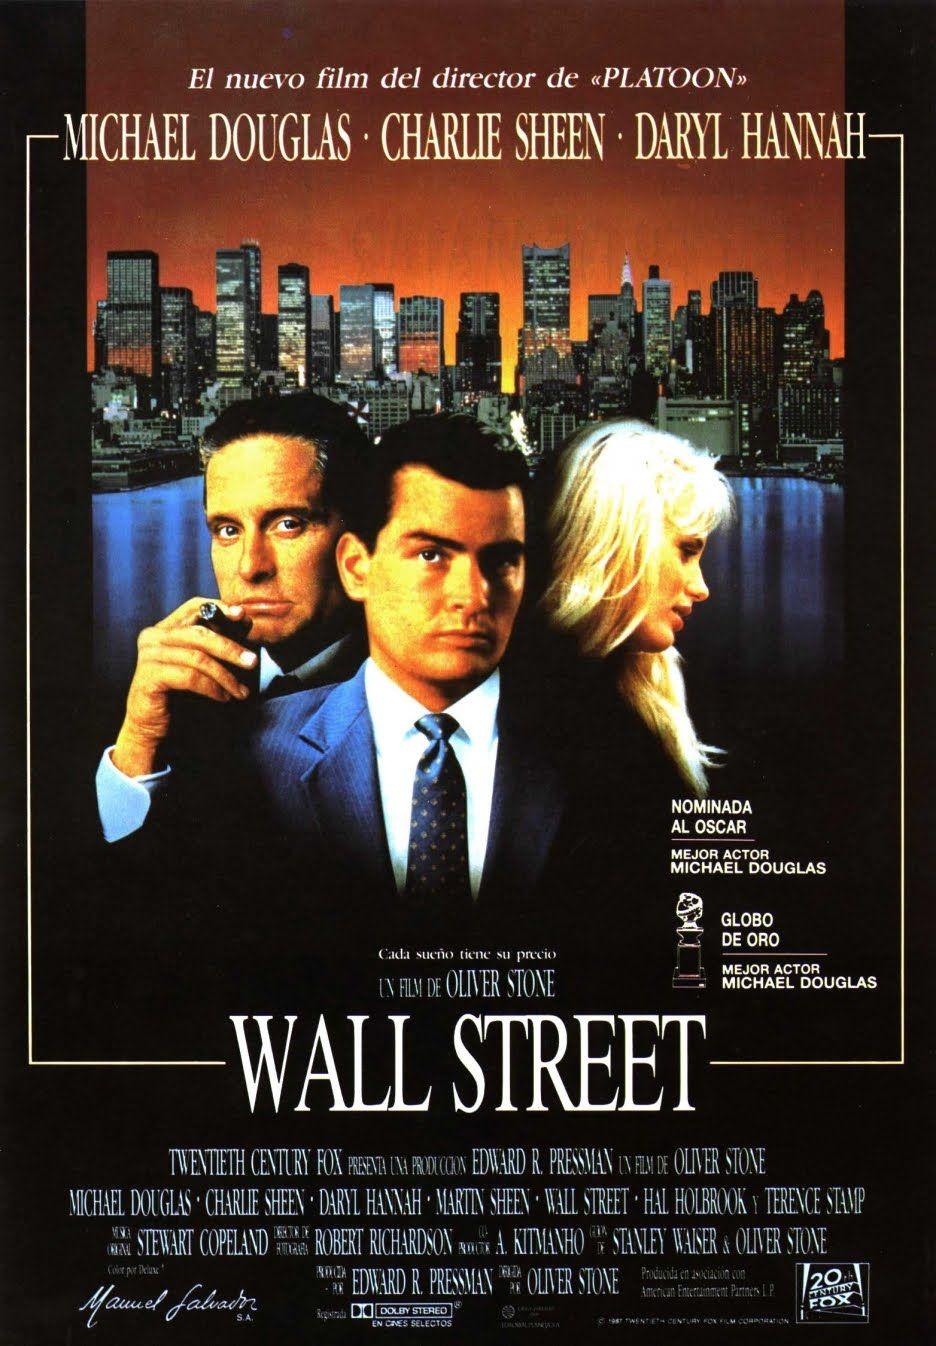 wall street movie posters wall street charlie sheen on wall street movie id=29500